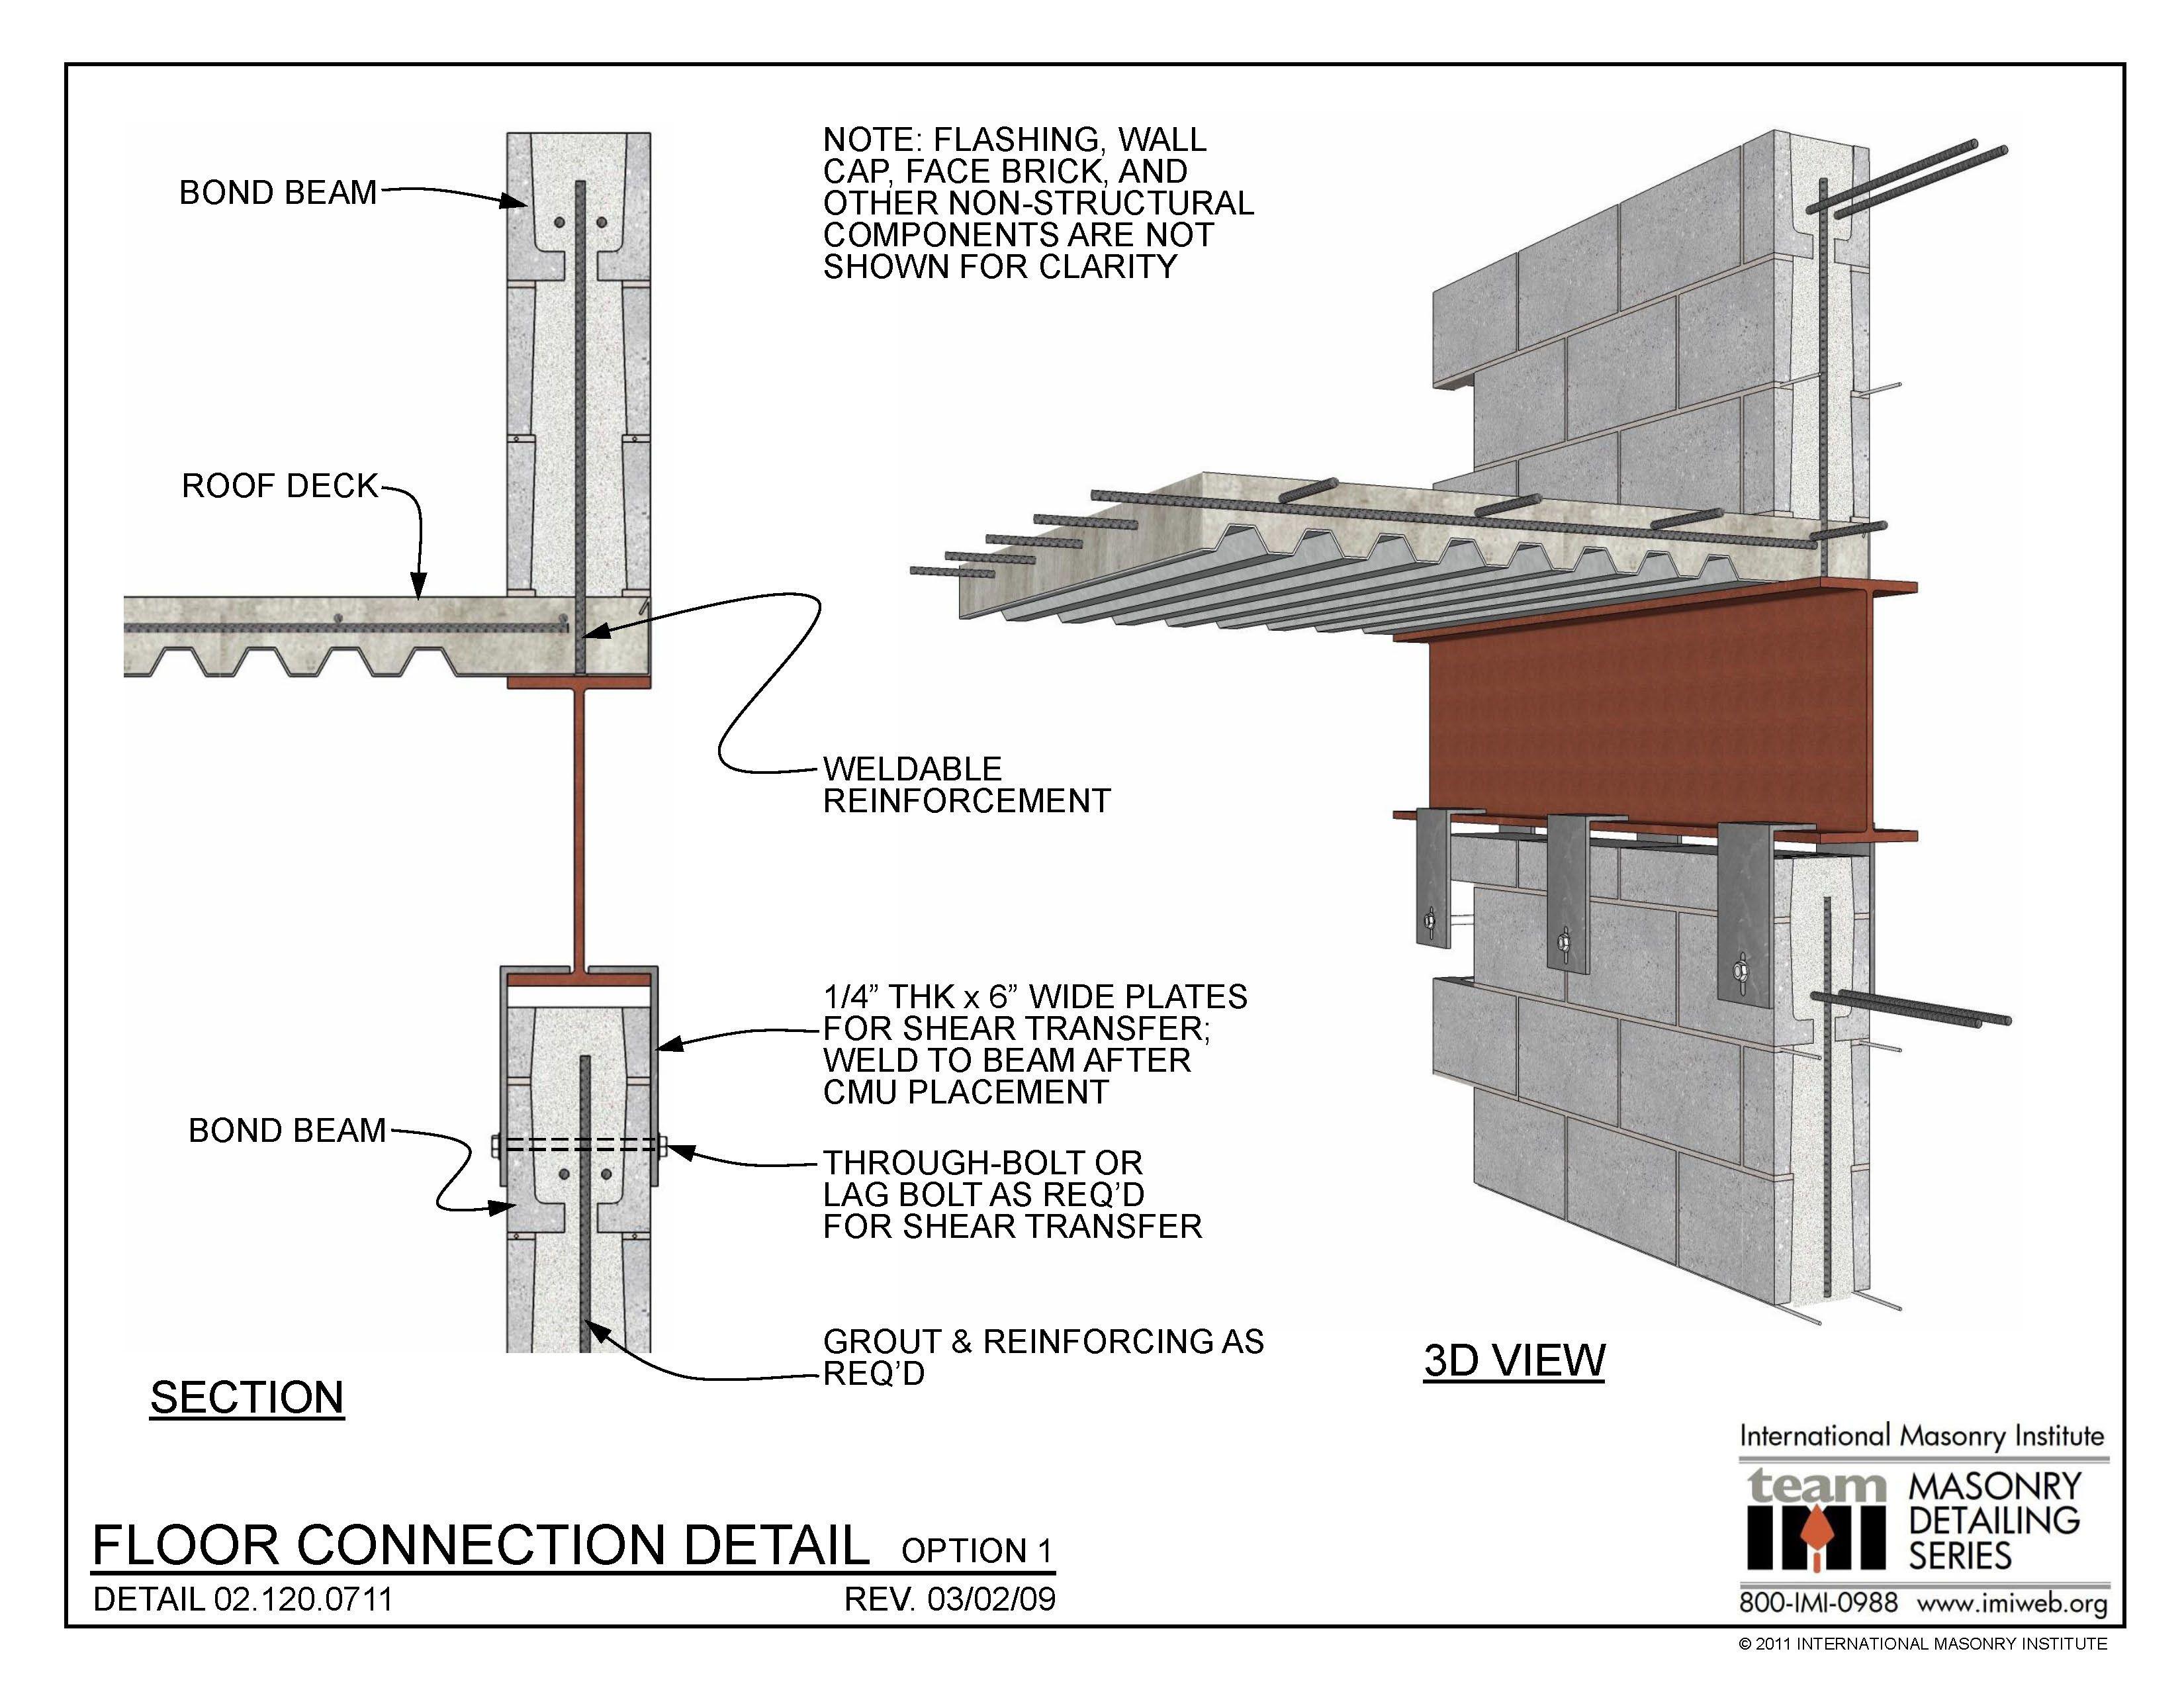 02 120 0711 Floor Connection Detail Option 1 International Masonry Institute Construction Details Architecture Metal Building Designs Masonry